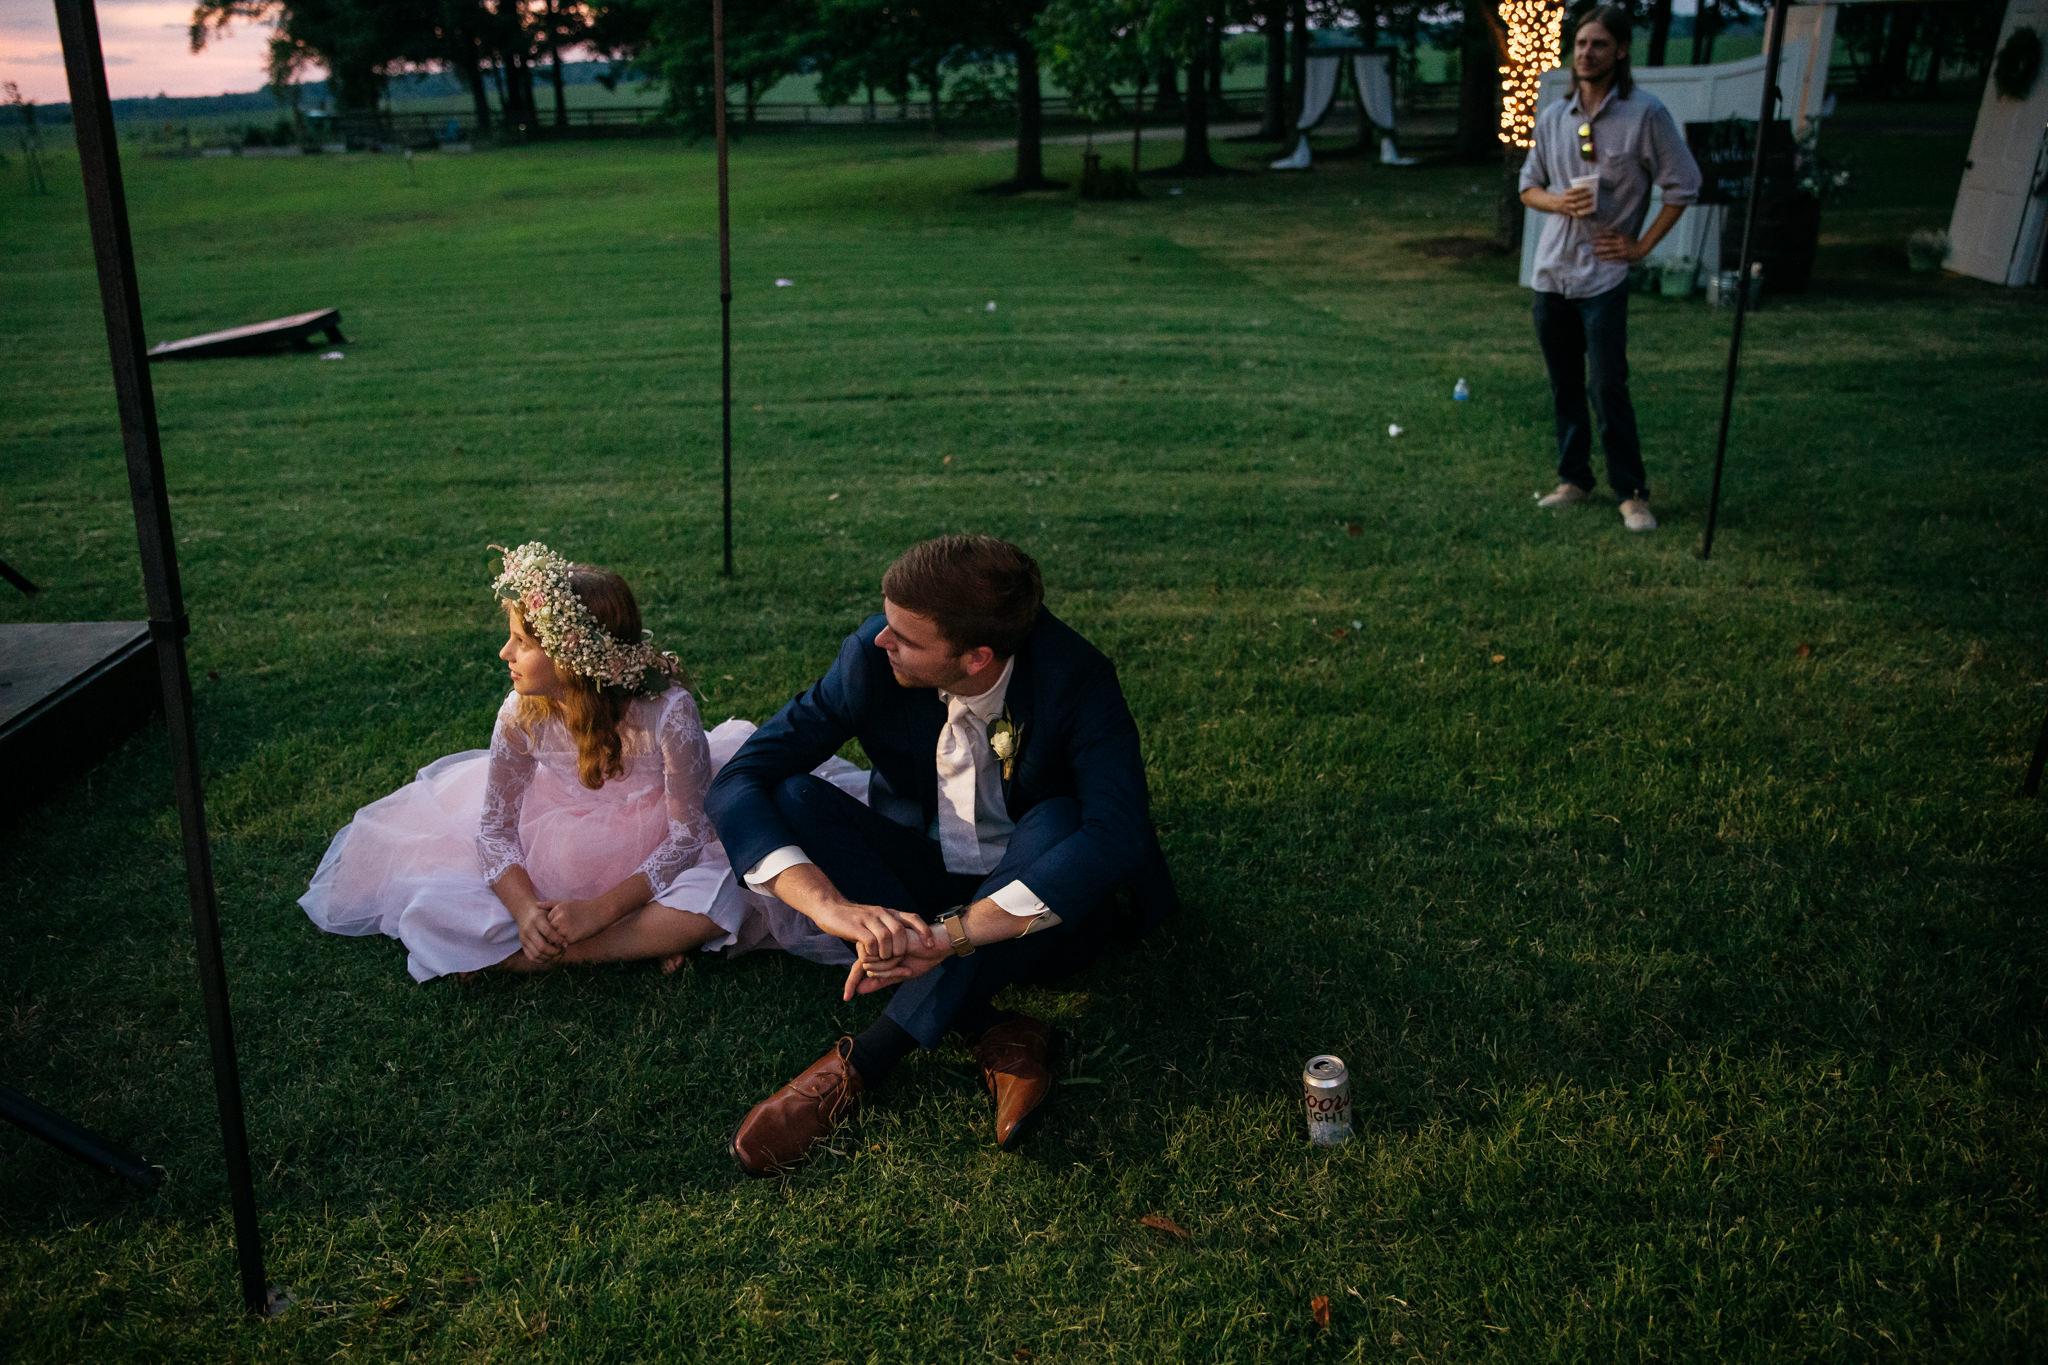 backyard-wedding-thewarmtharoundyou-lexy-branson-42.jpg